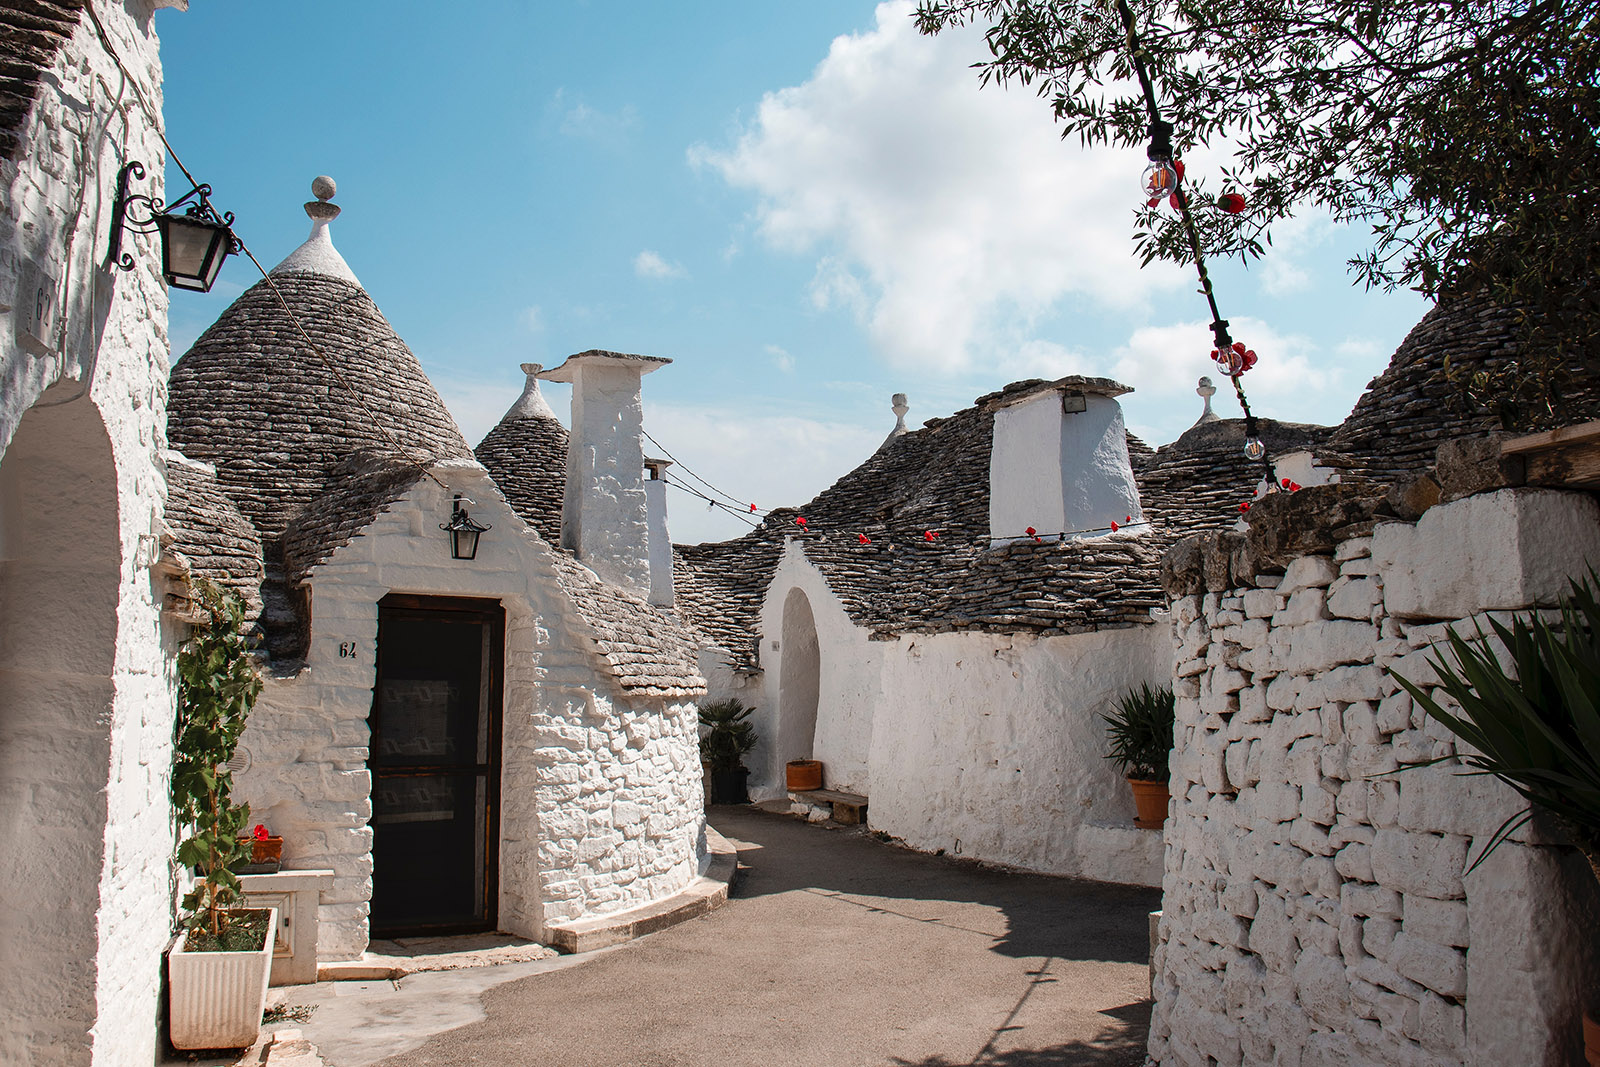 white stucco buildings in alberobello, italy